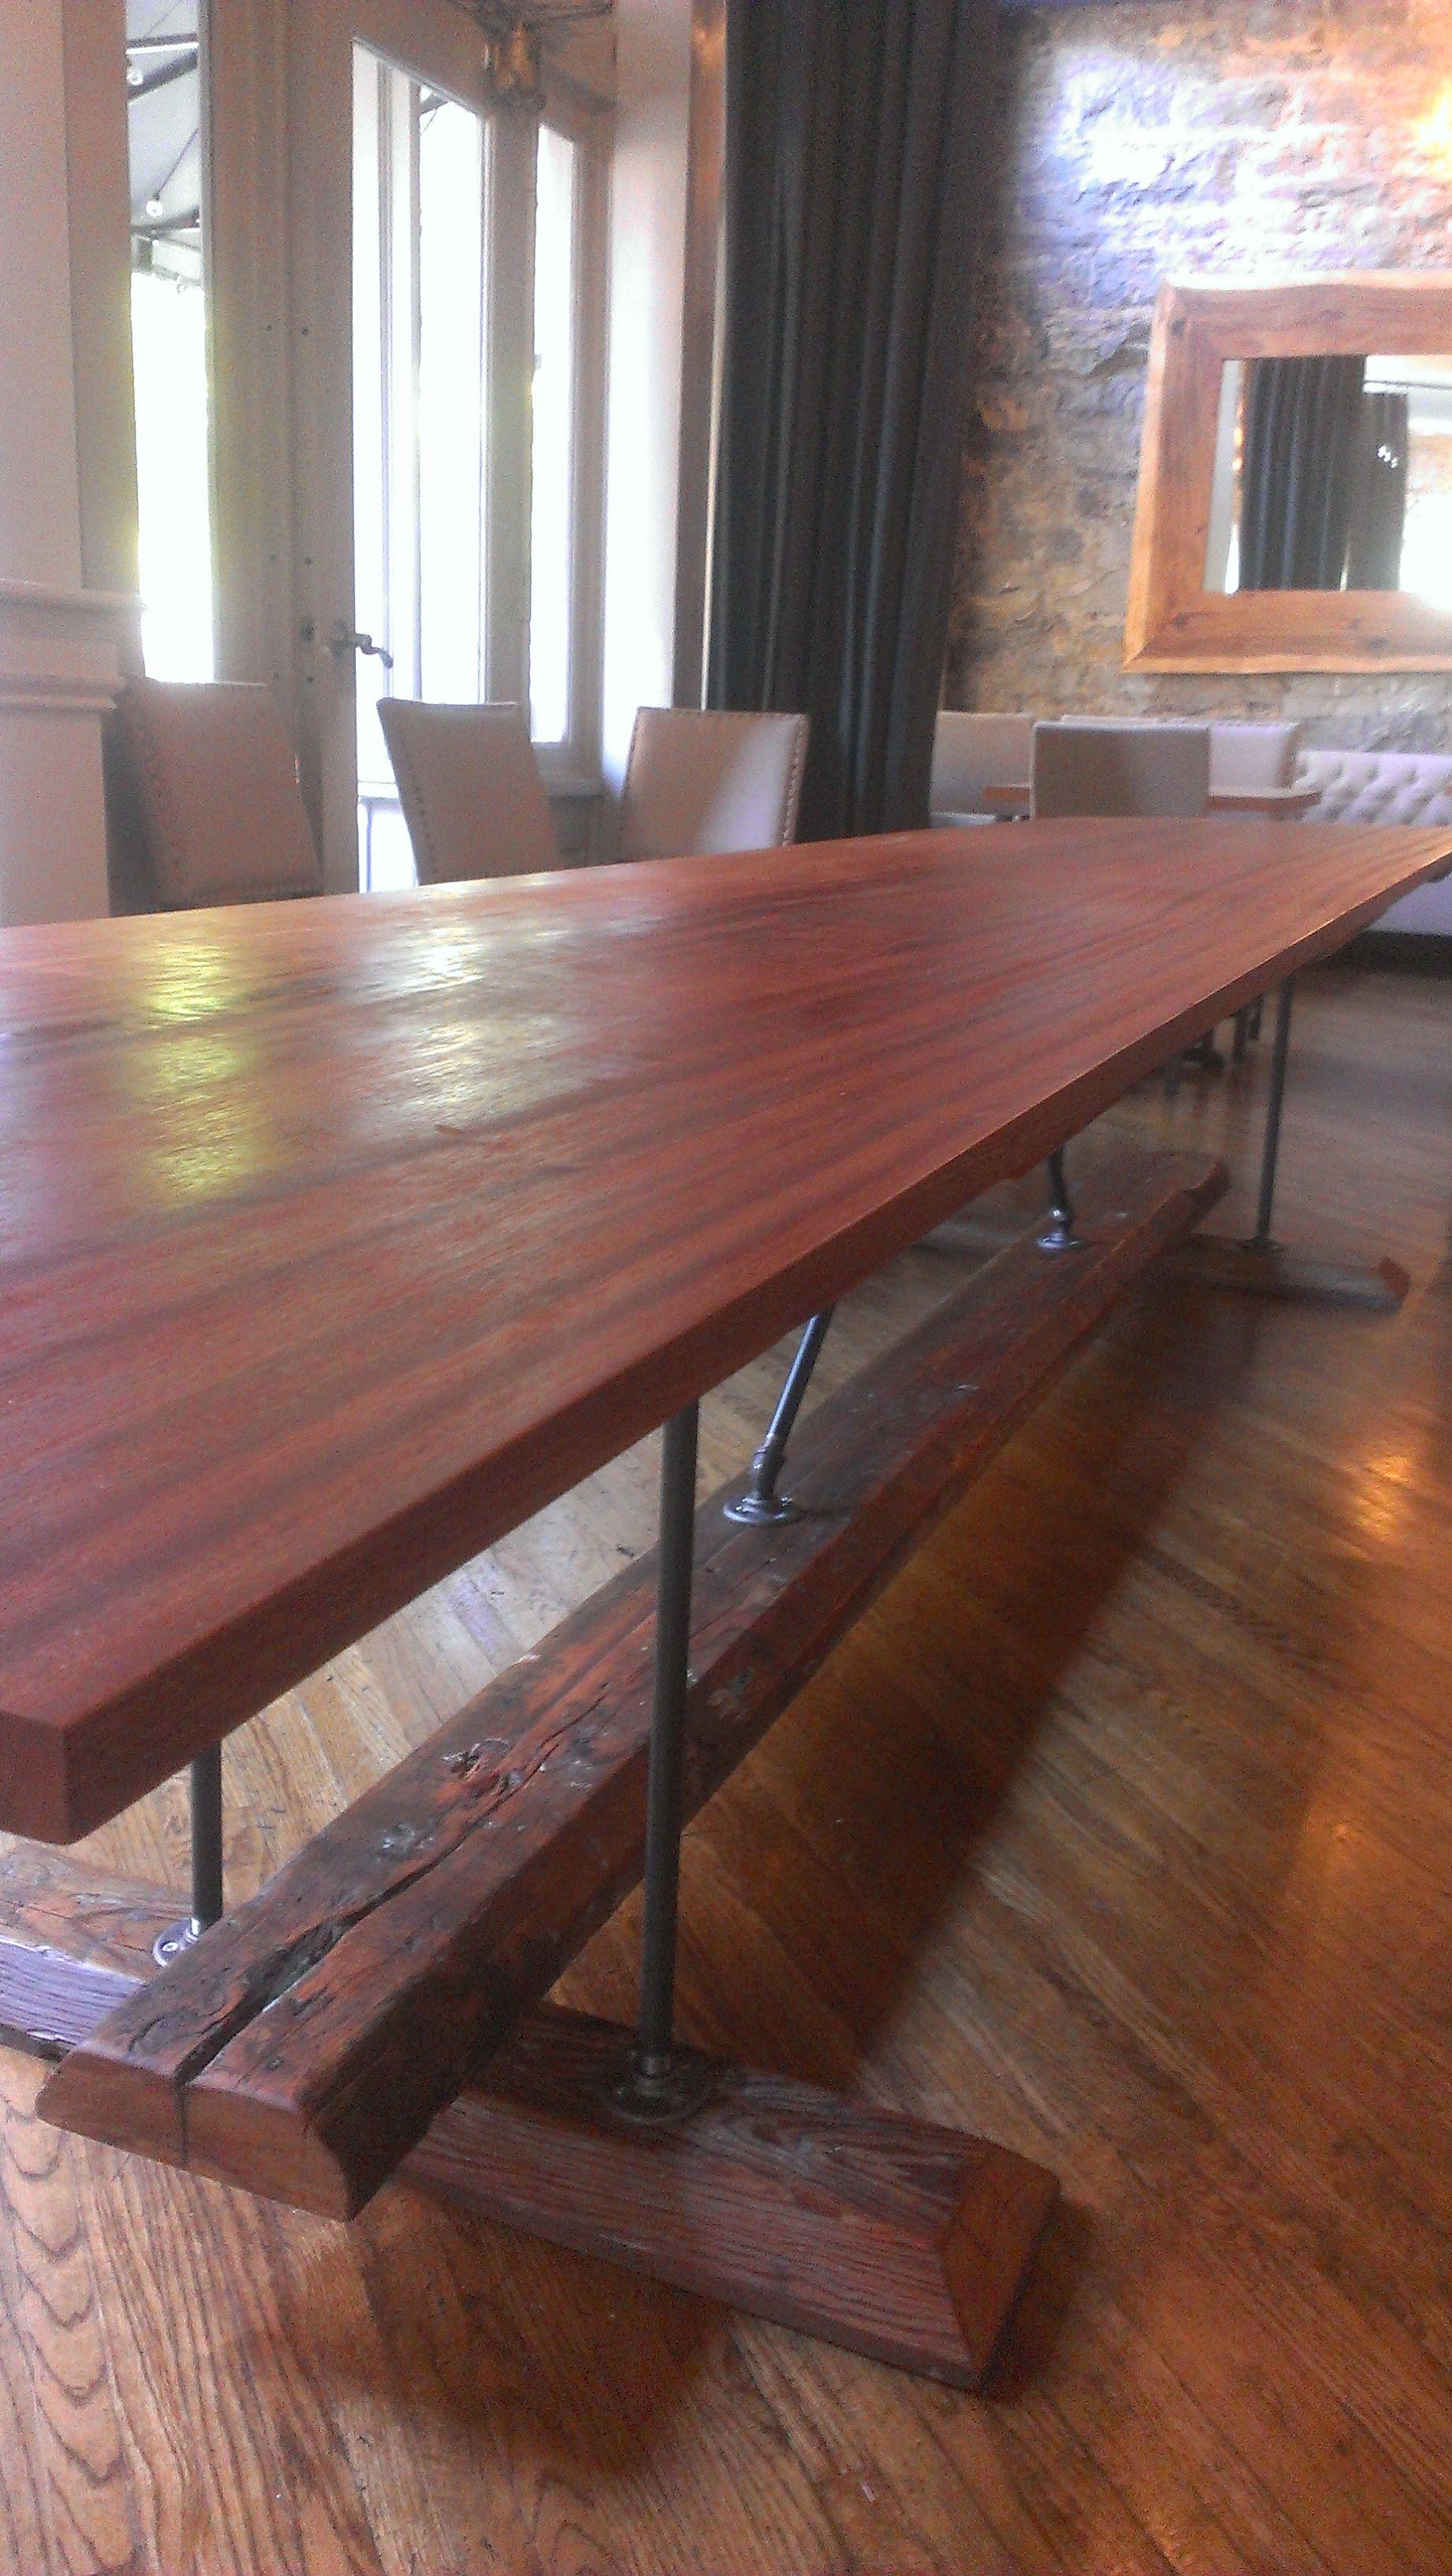 Peachy Industrial Farmhouse Table 14 Reclaimed 100 Year Old Heart Interior Design Ideas Lukepblogthenellocom